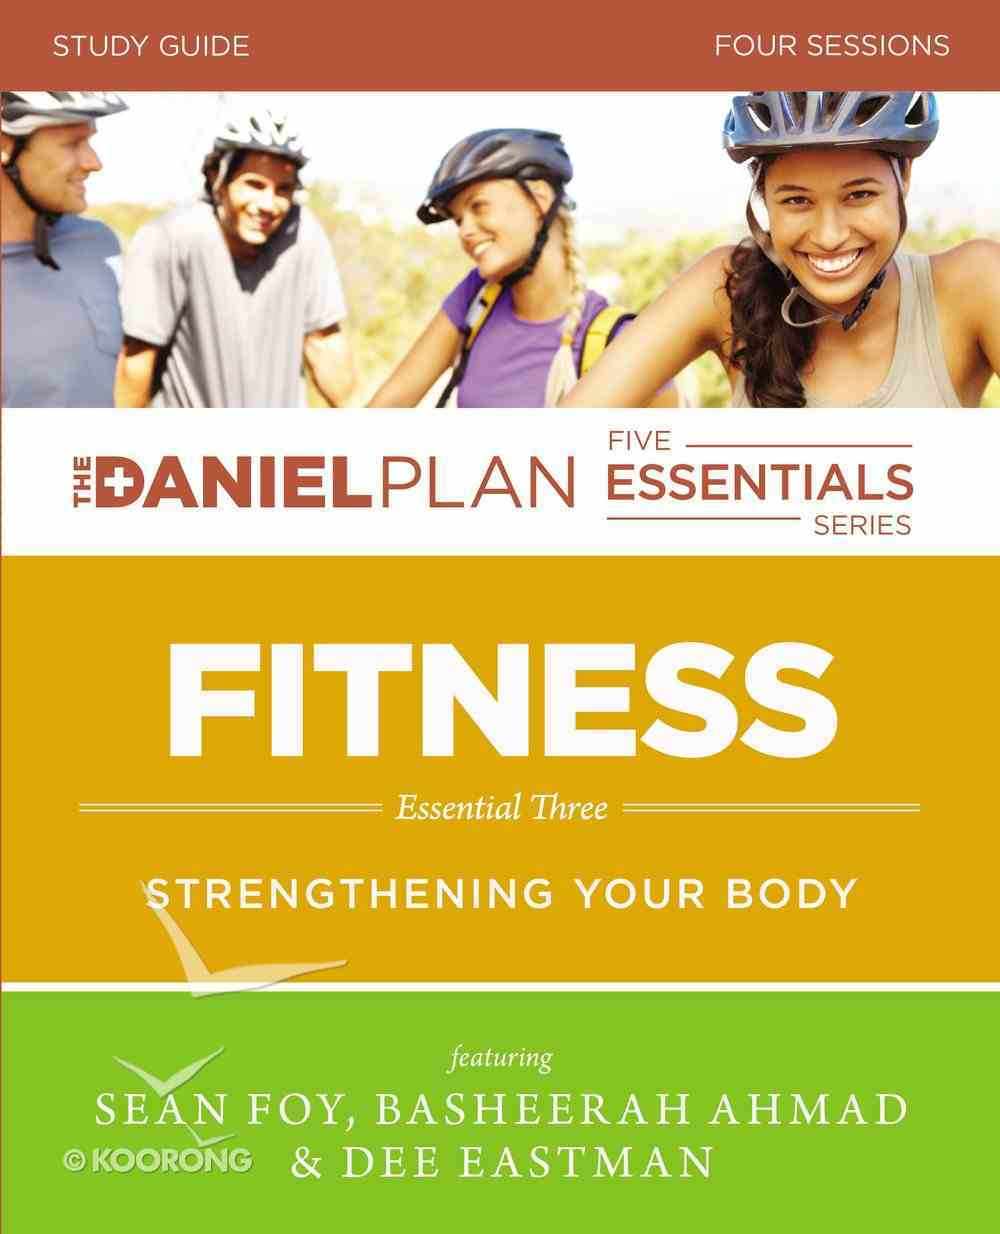 Fitness Study Guide (The Daniel Plan Essentials Series) eBook